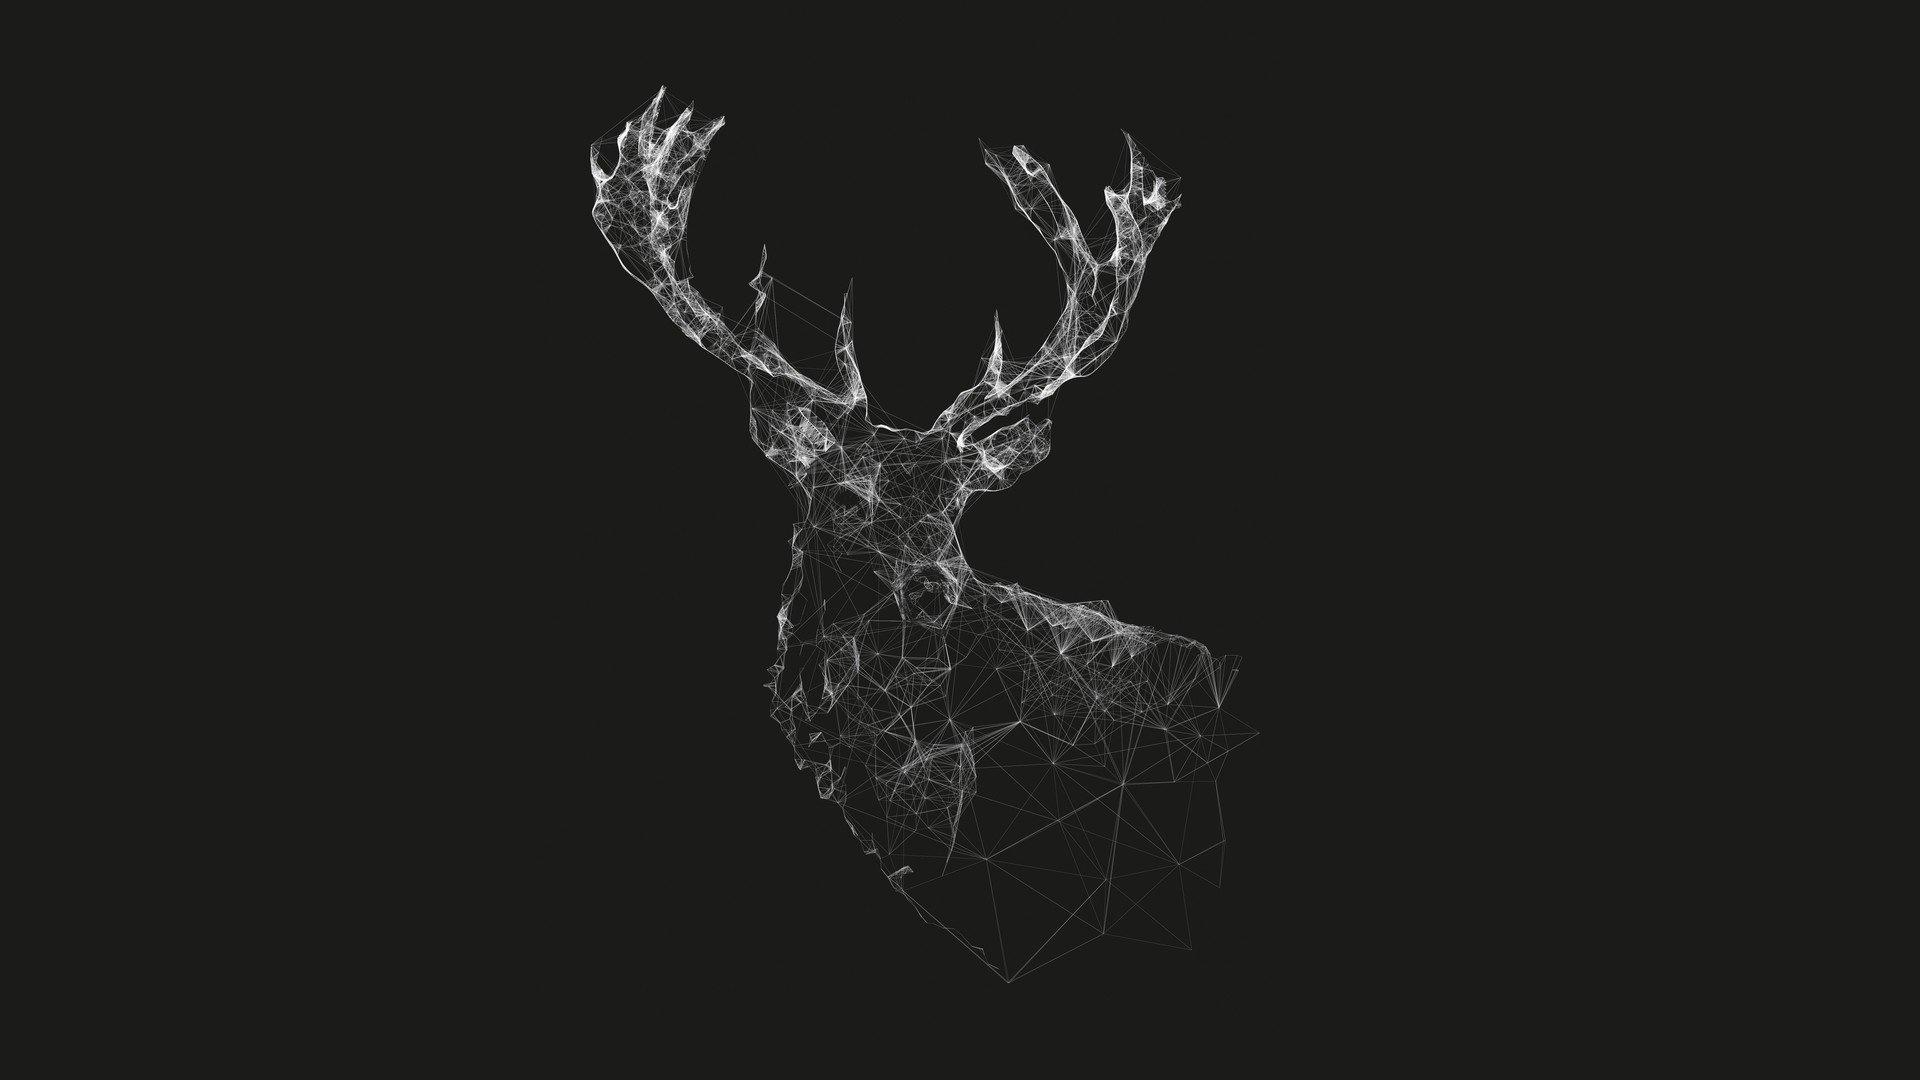 Deer wallpapers photos and desktop backgrounds up to 8k - 8k minimal wallpaper ...